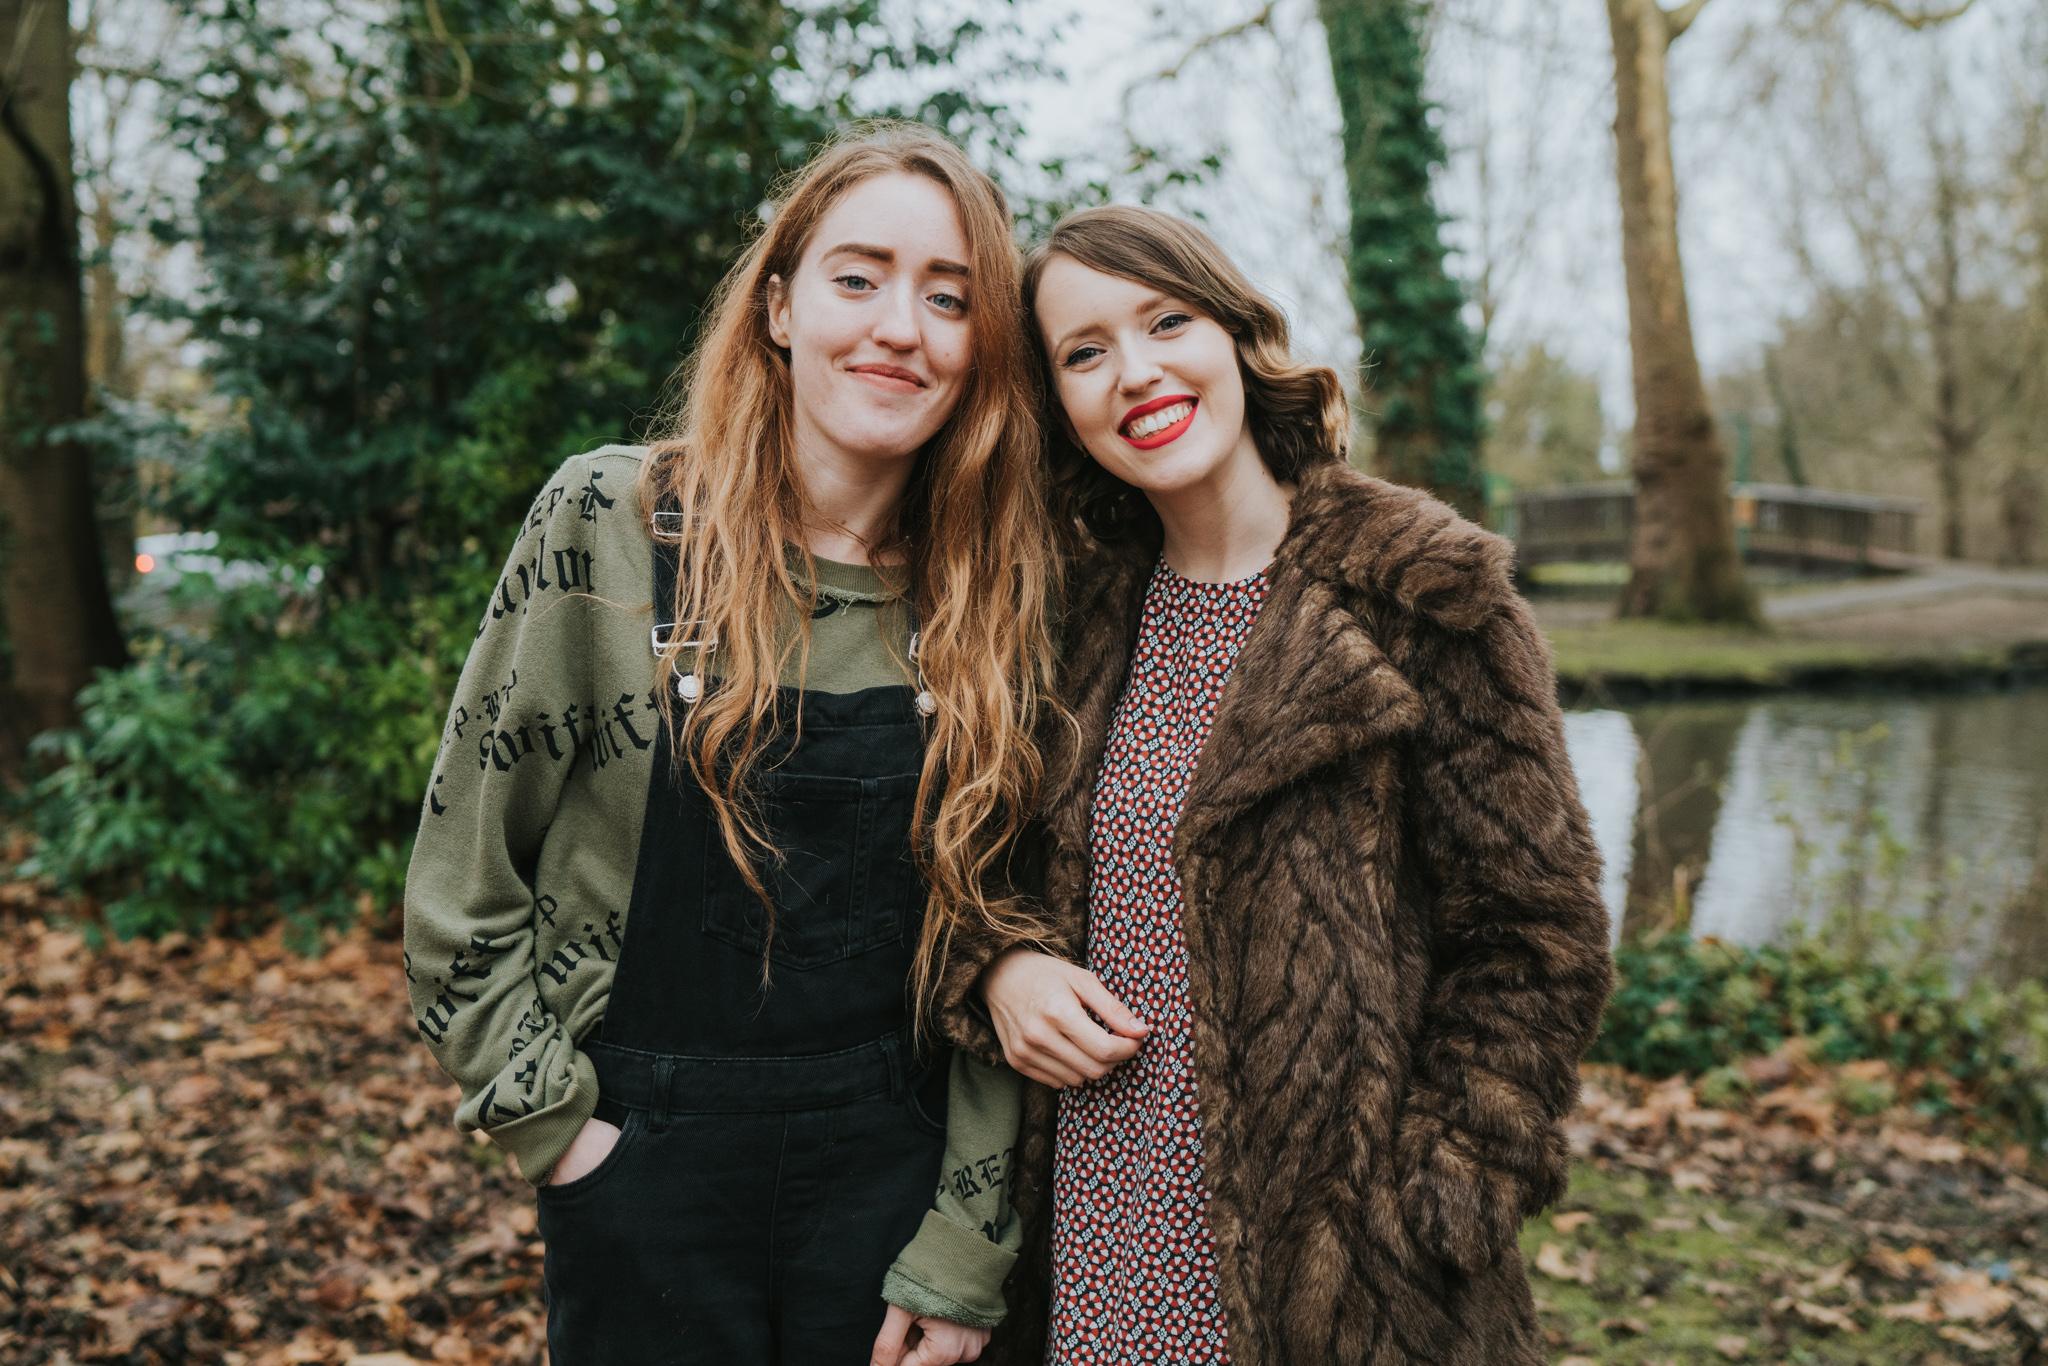 Hertfordshire-extended-family-session-grace-elizabeth-colchester-essex-alternative-wedding-photographer-suffolk-devon-norfolk (10 of 26).jpg